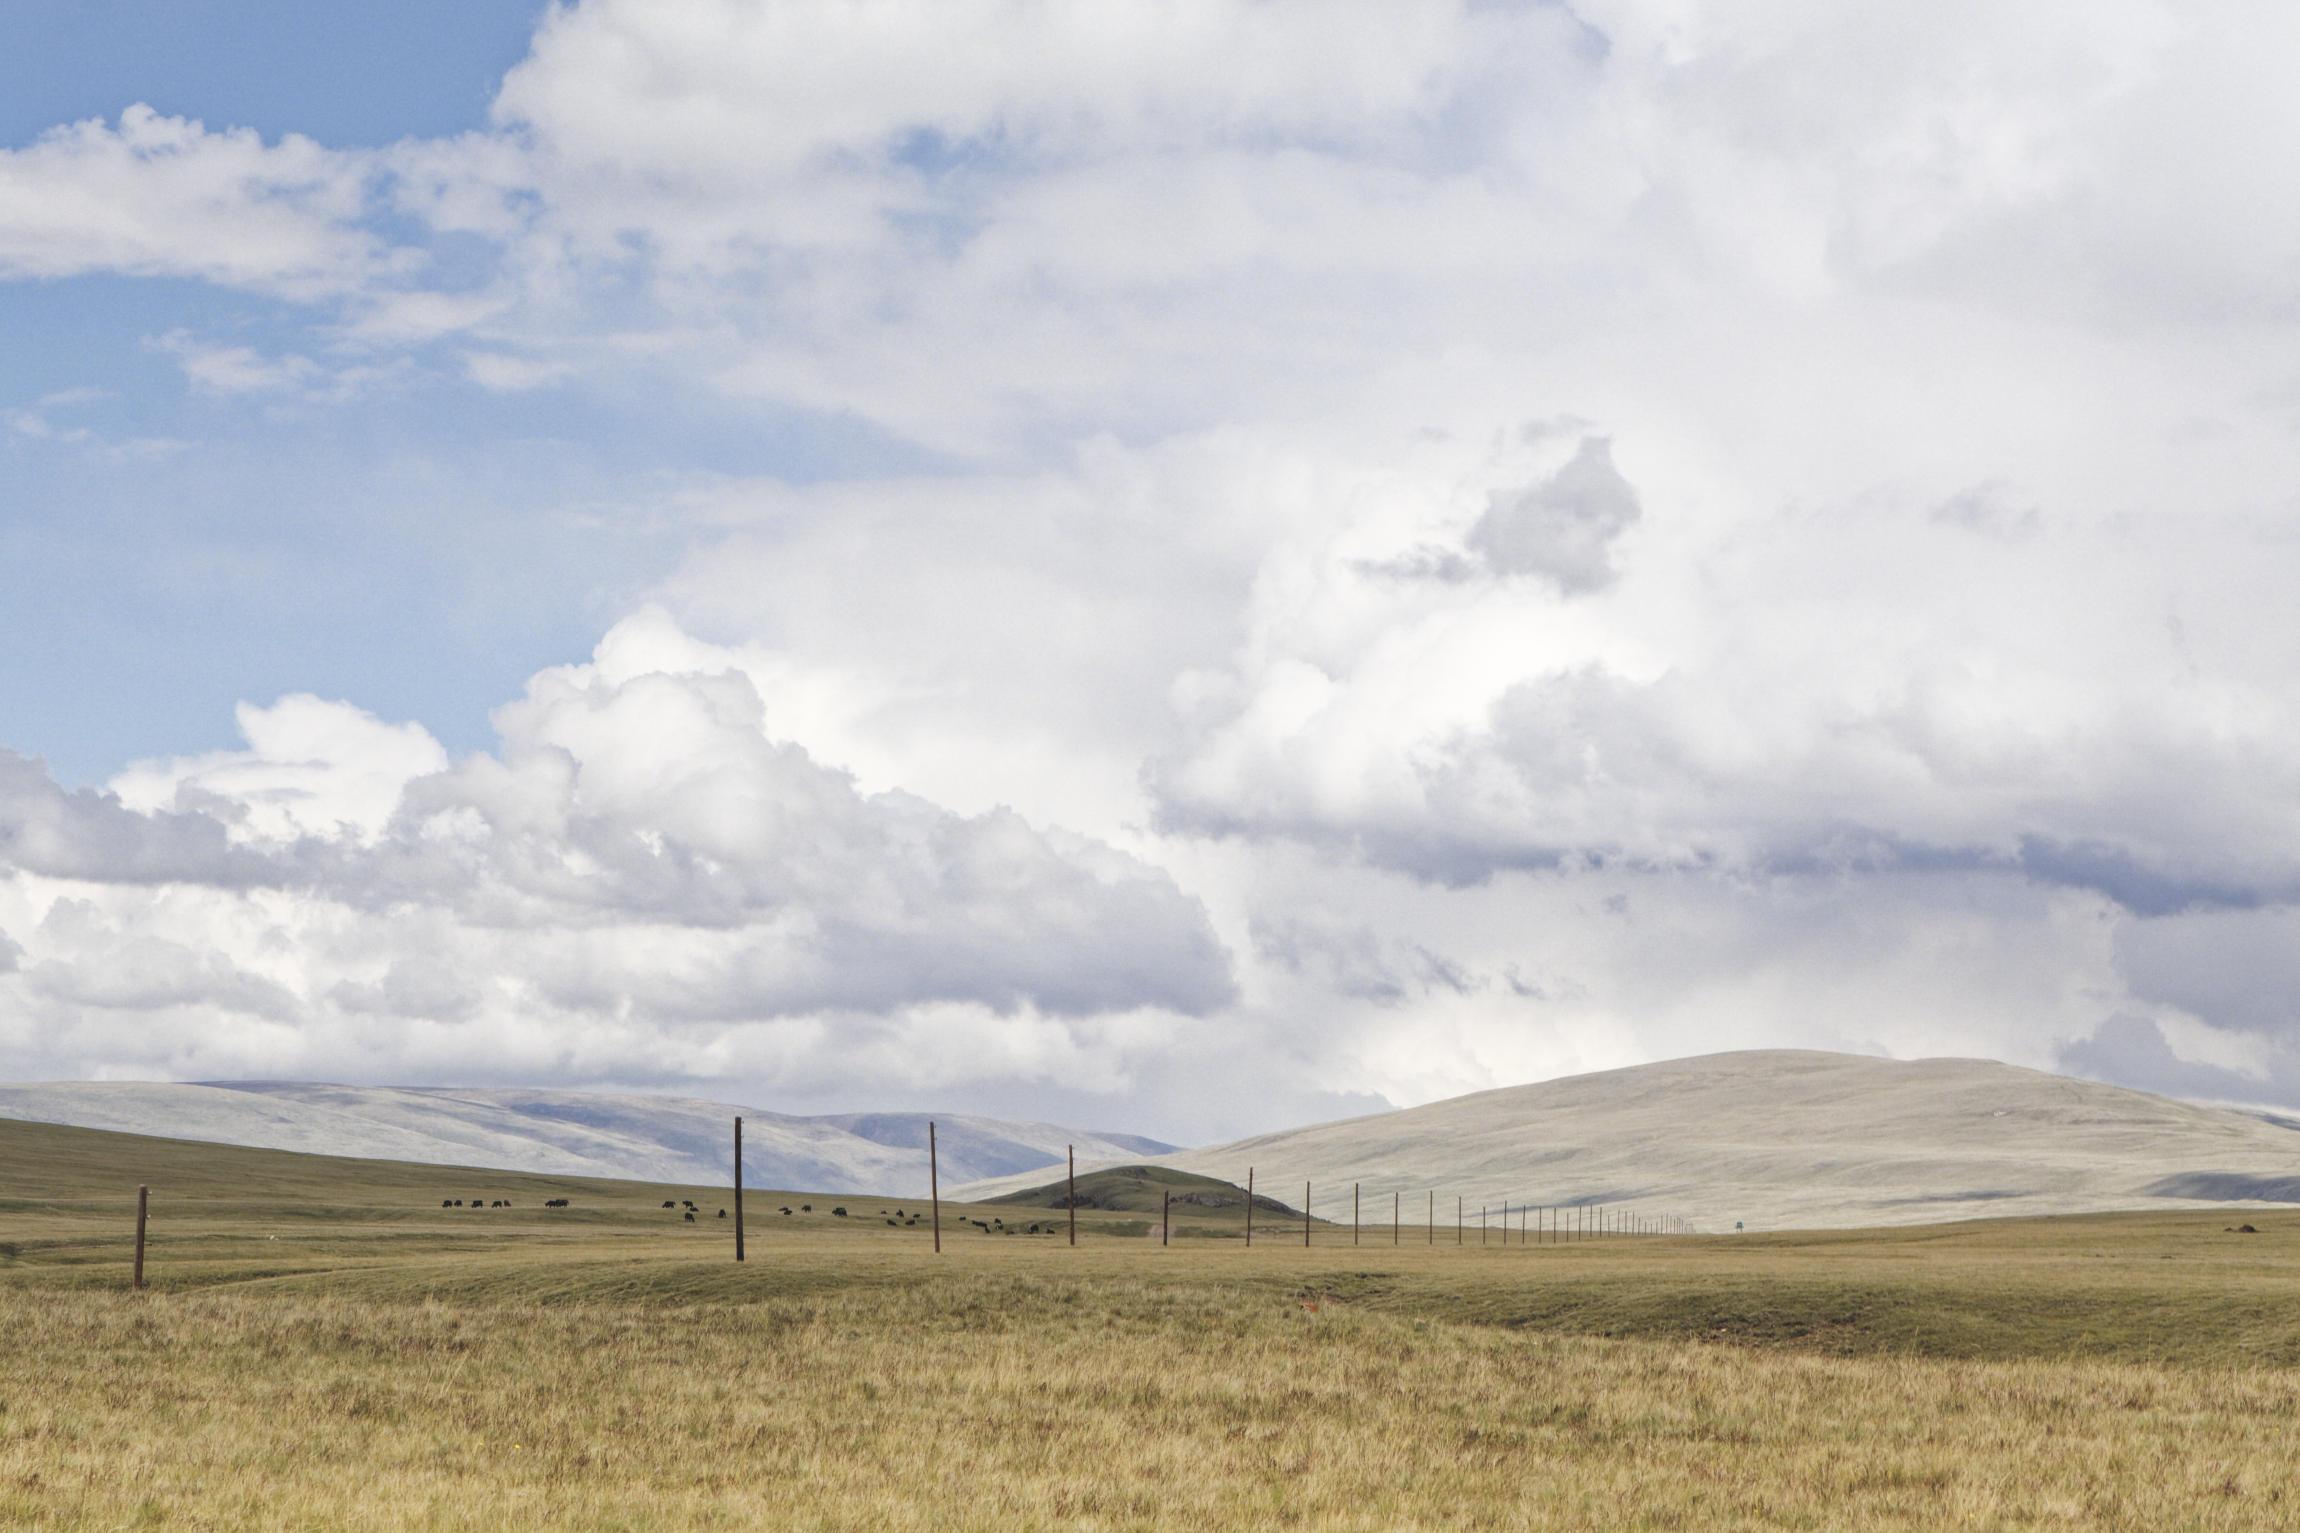 Steppe Eshkeli Tash Kirghizstan